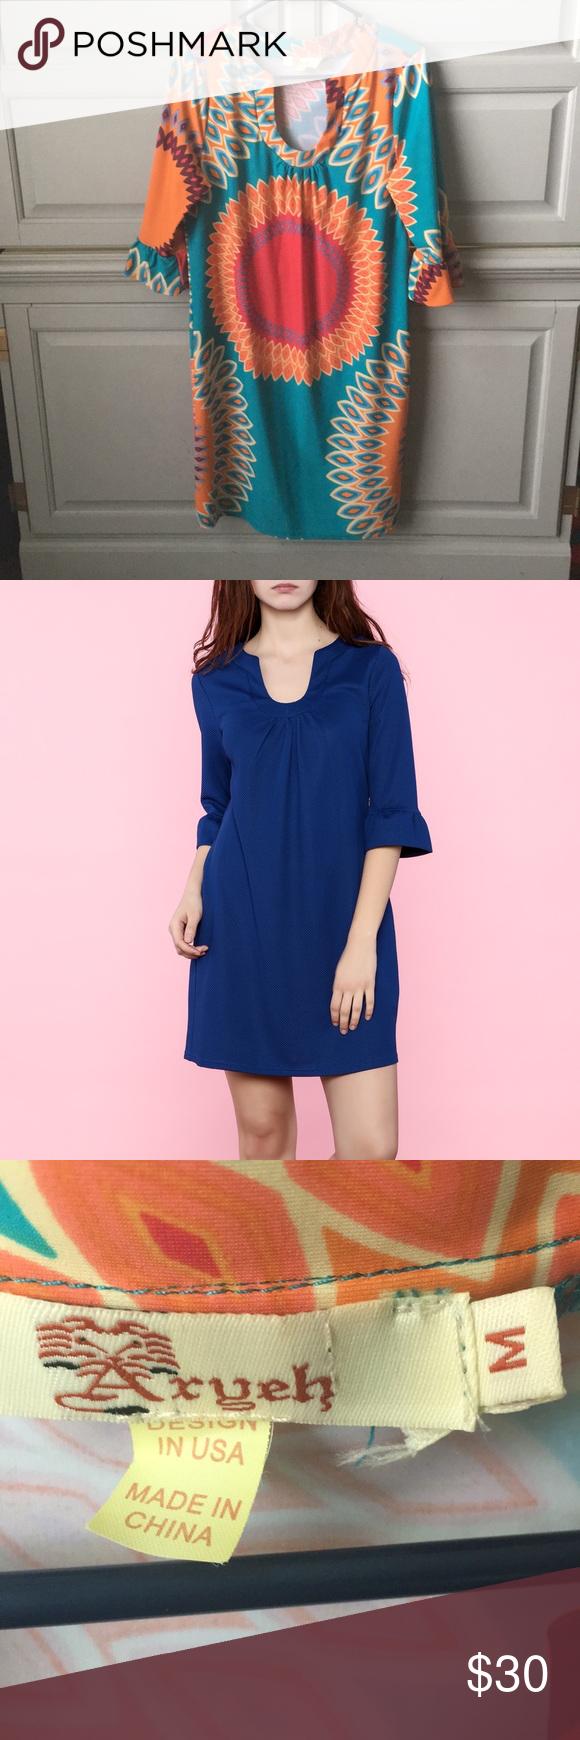 Aryeh 3 4 Sleeve Shift Dress Shift Dress Dresses Aryeh [ 1740 x 580 Pixel ]